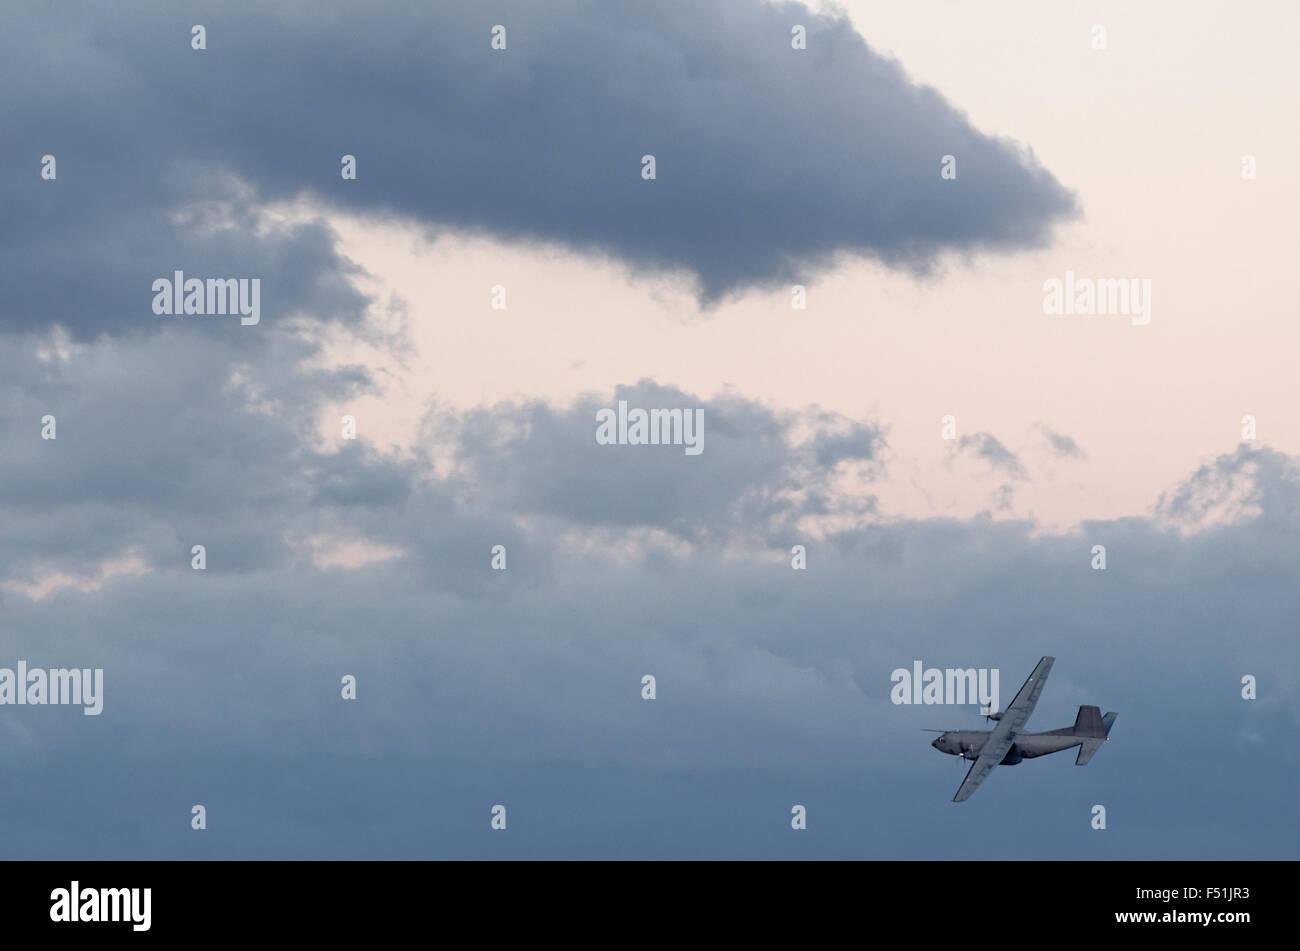 The Transall C160 of Transport Squadron Overseas 50 Reunion (Air Detachment 181) in flight - Stock Photo